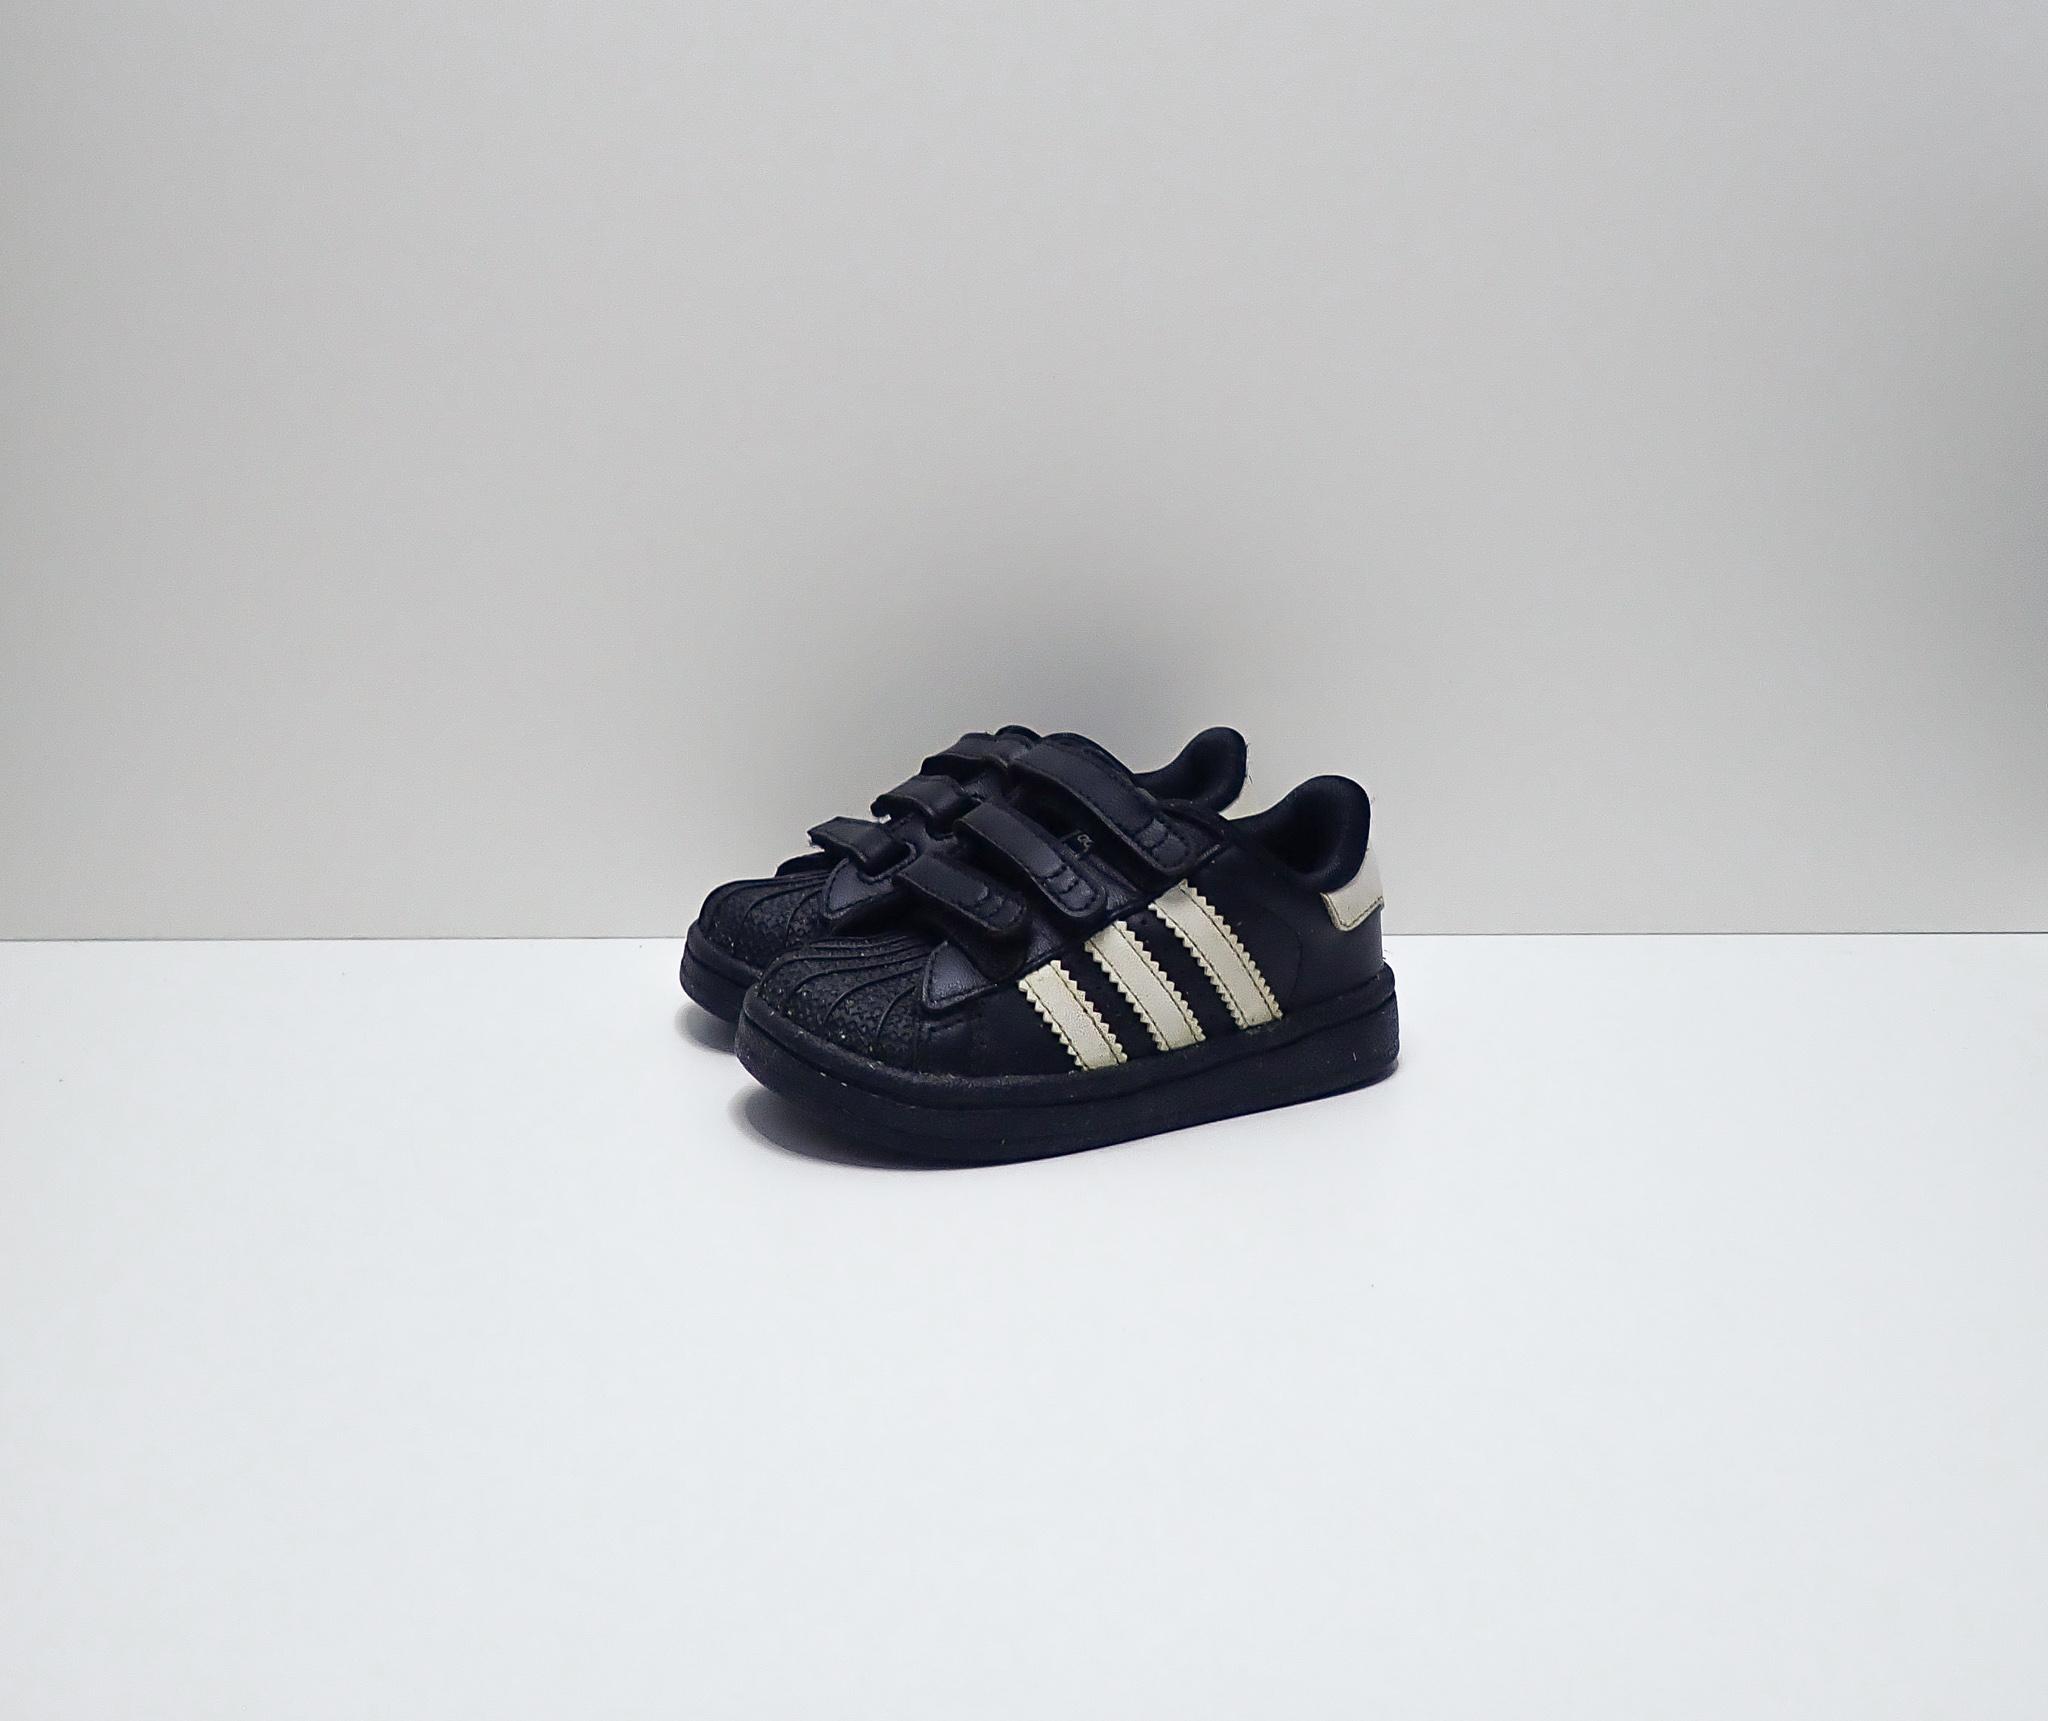 Adidas Superstar Toddler